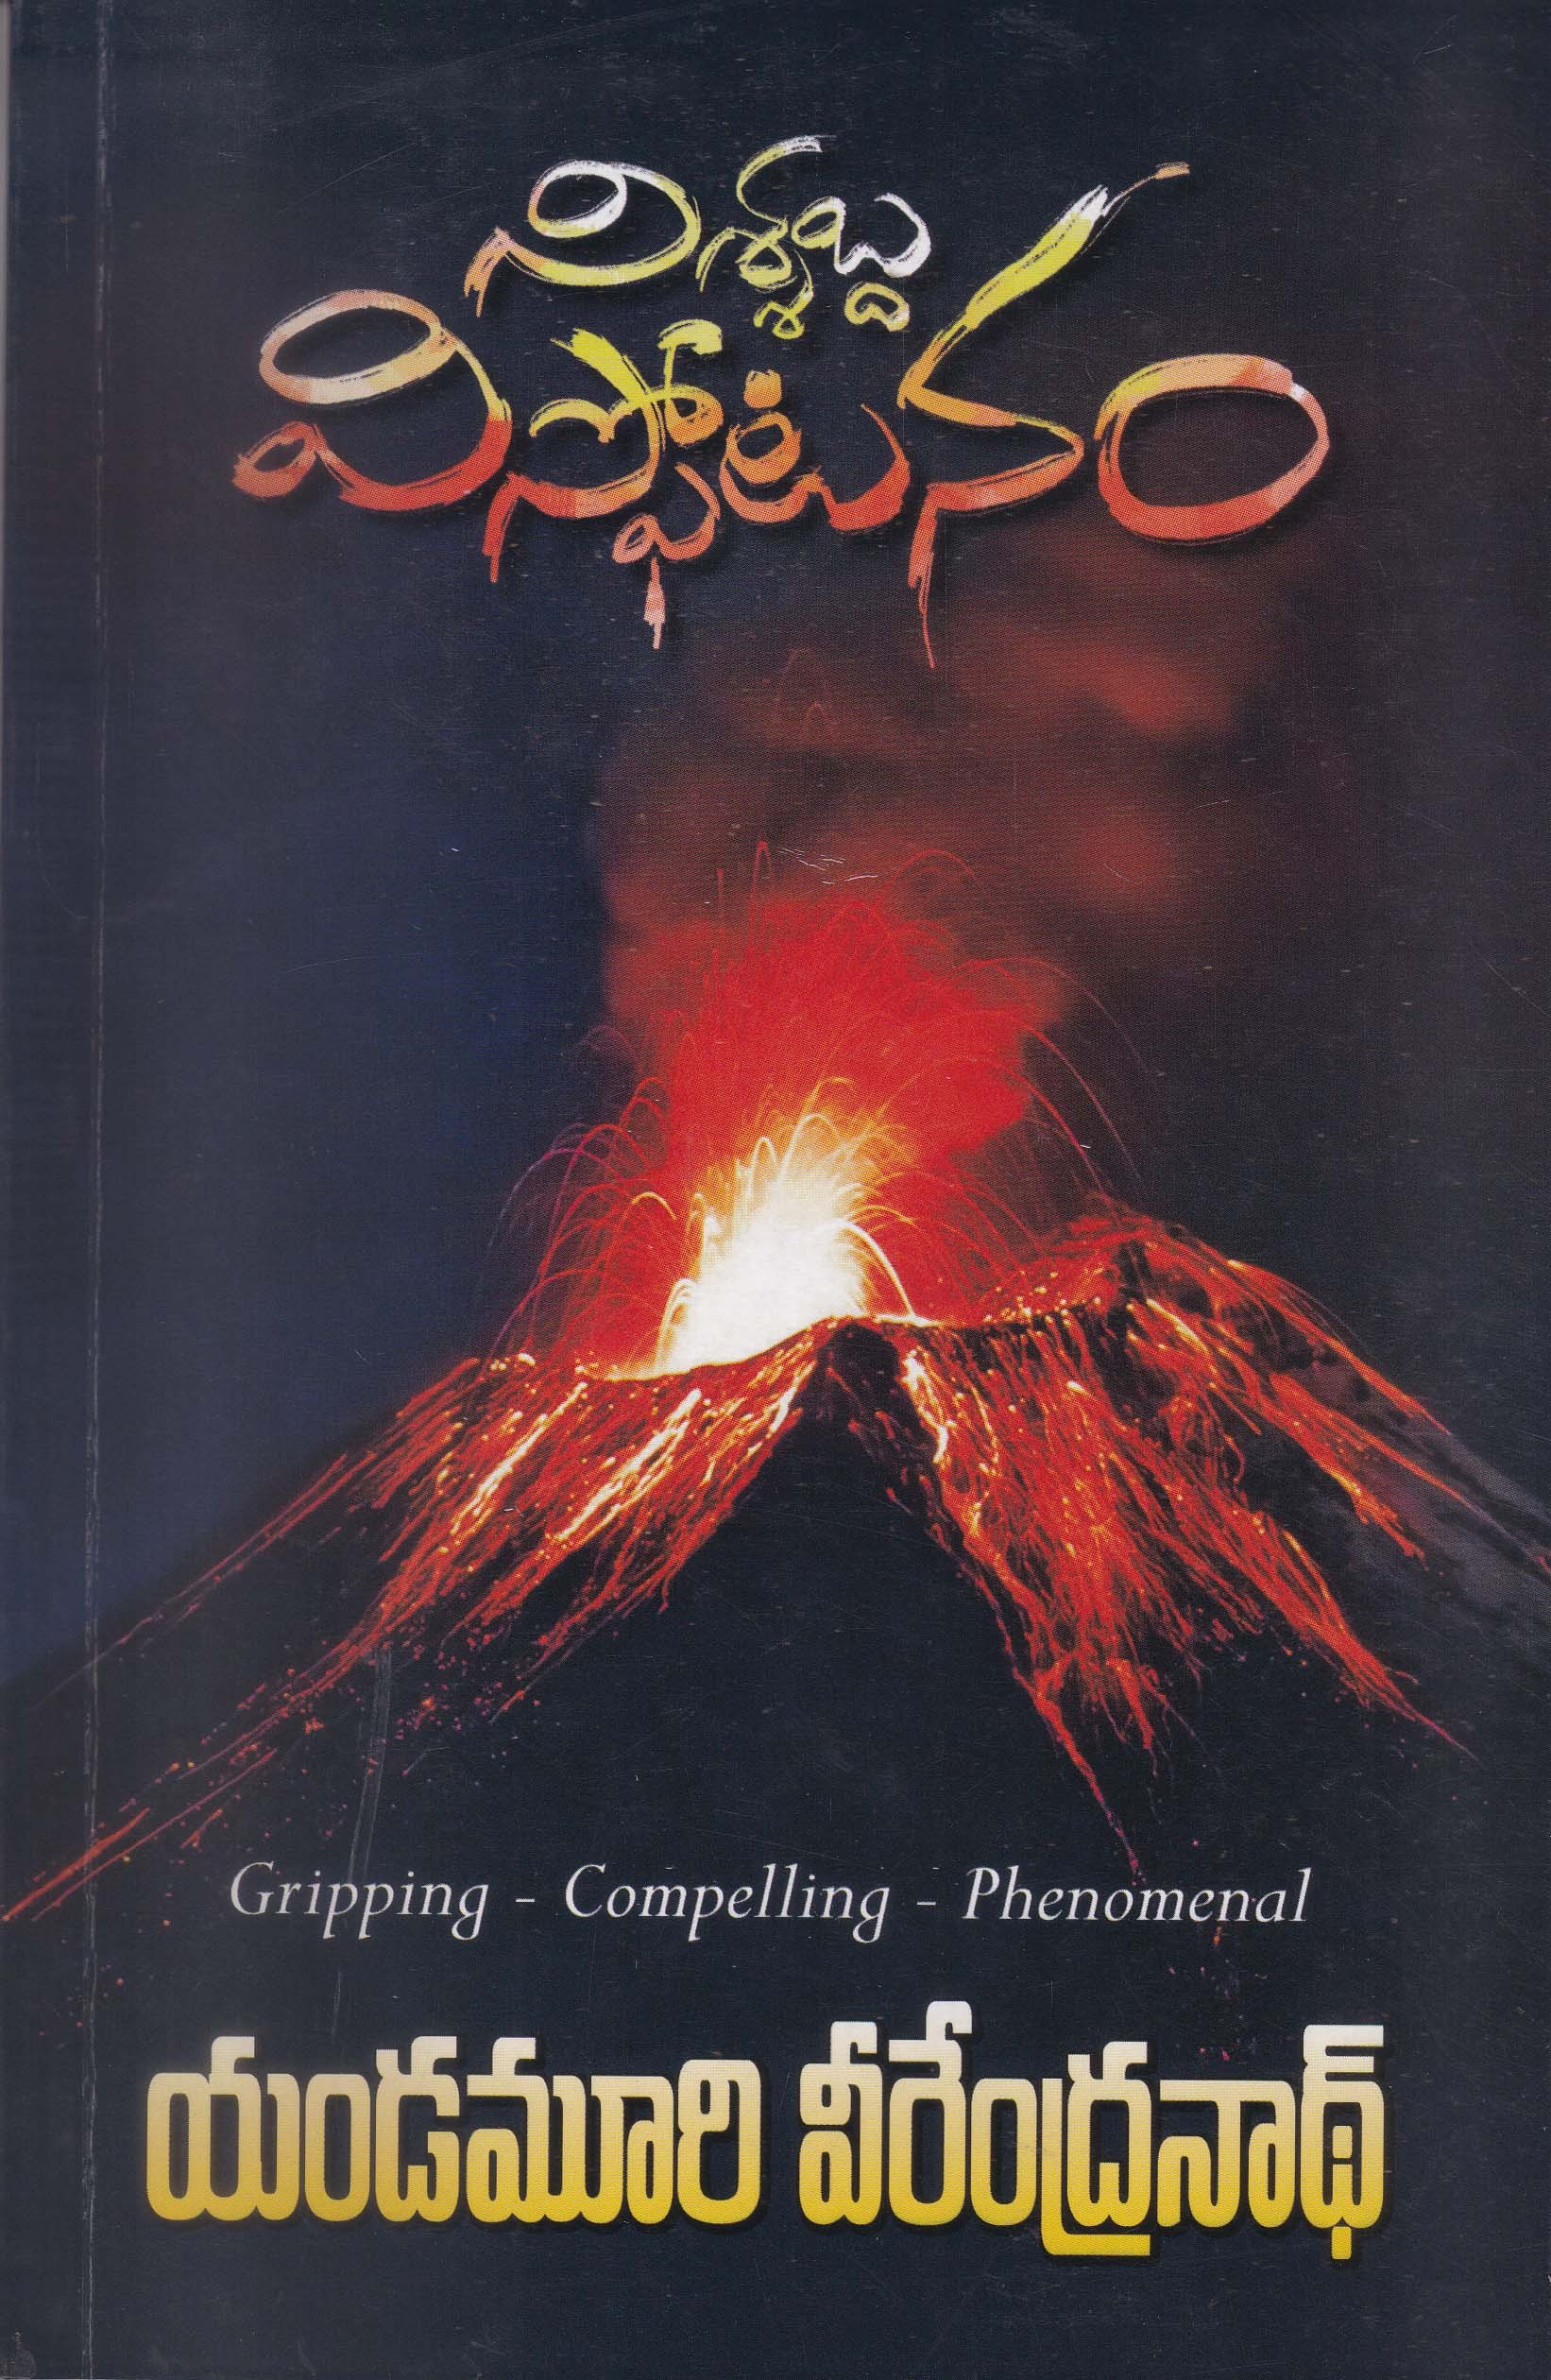 nissabda-vispotanam-telugu-book-by-yandamoori-veerendranat